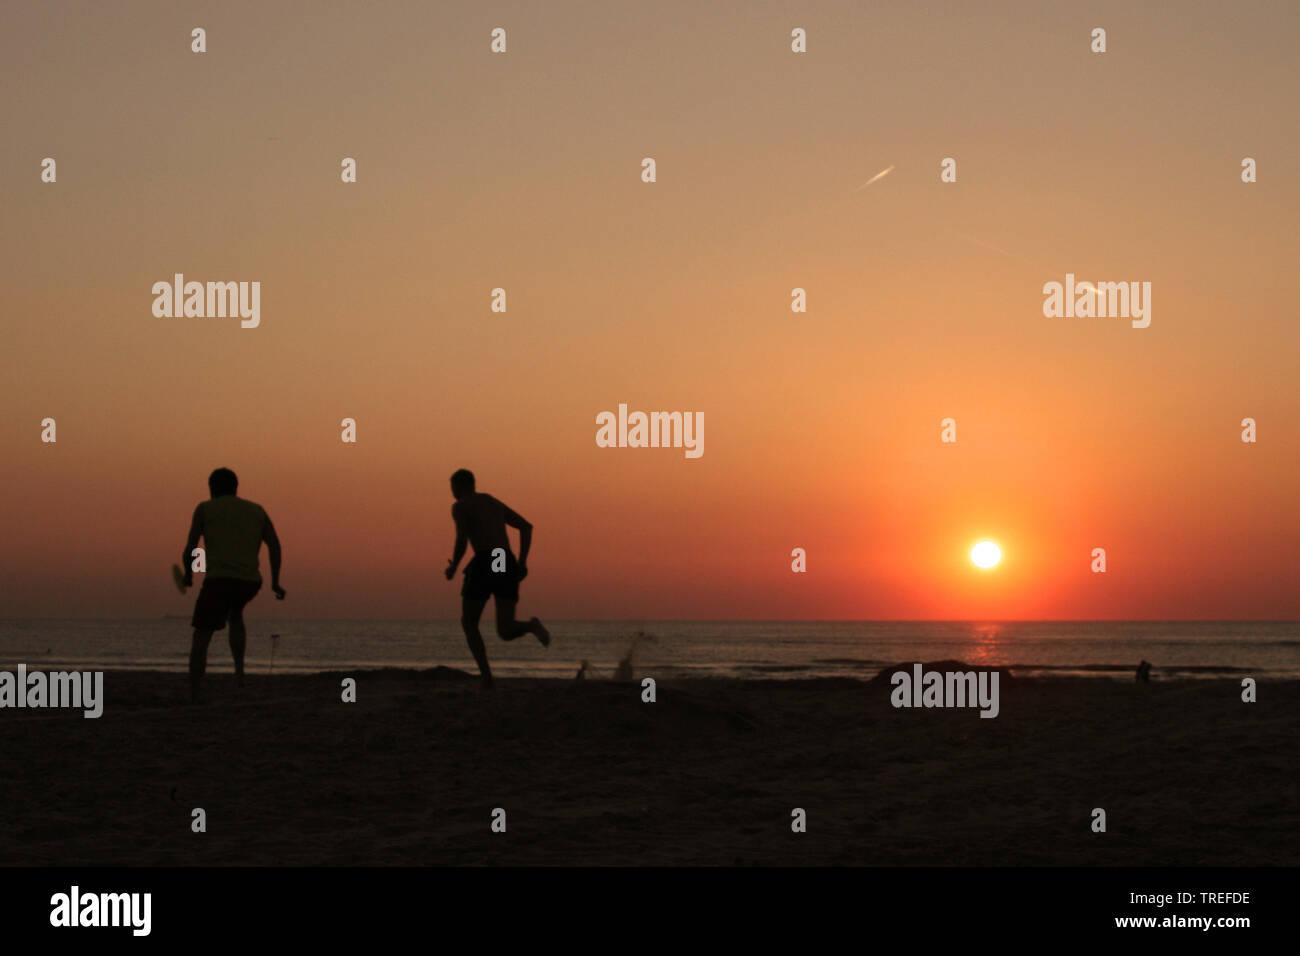 Zwei Sportler am Strand bei Sonnenuntergang, Niederlande, Katwijk   two sportsman on the beach at sunset, Netherlands, Katwijk   BLWS525258.jpg [ (c) - Stock Image